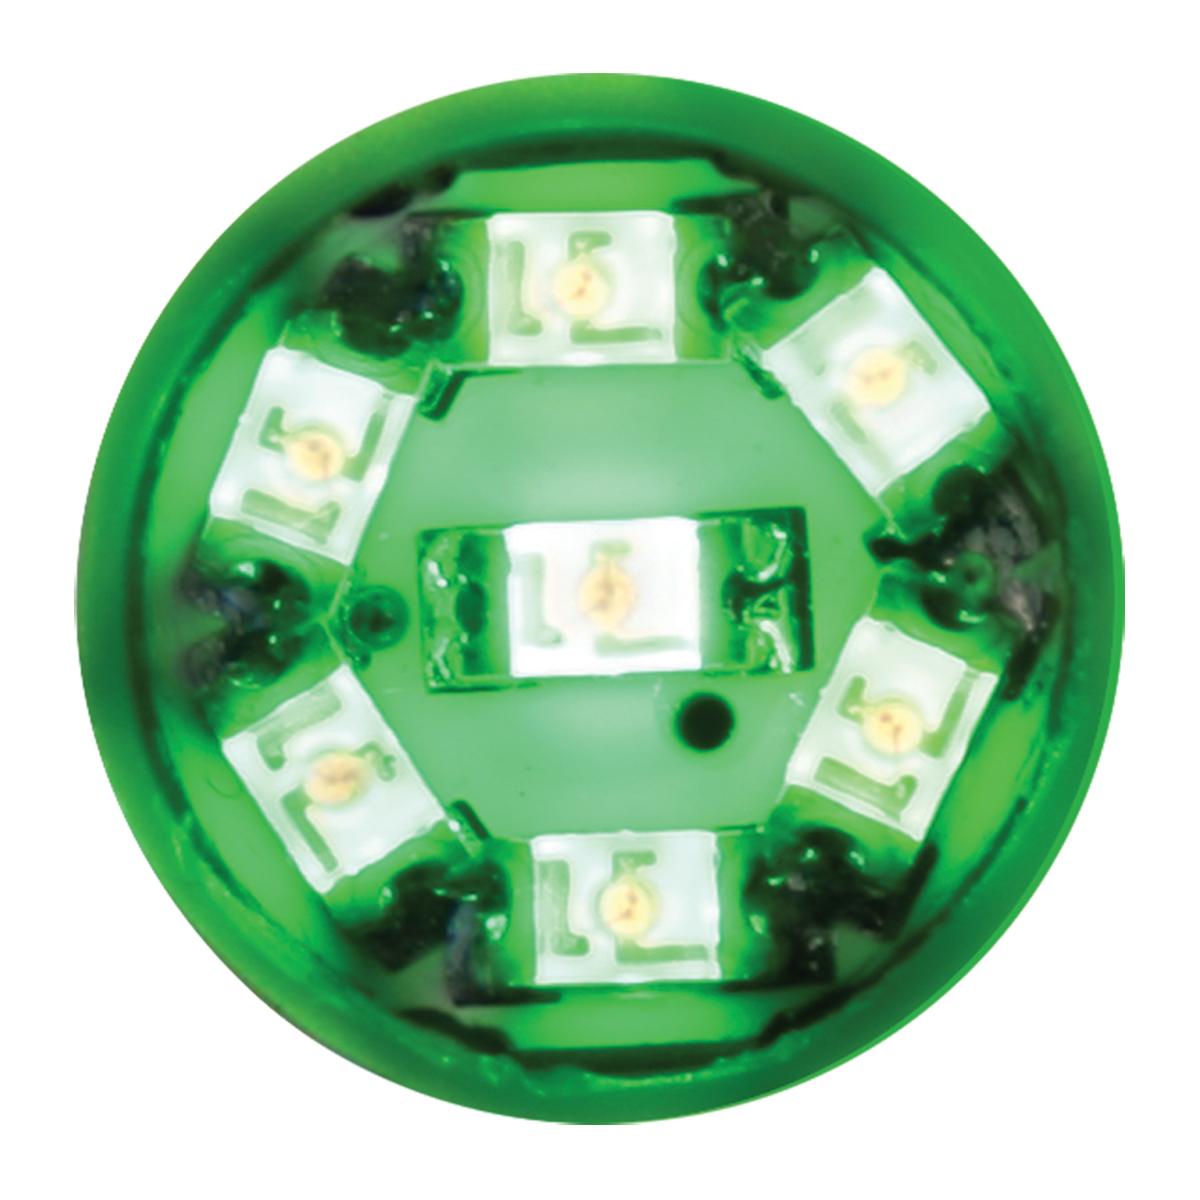 74902 Green 194/168 Dome Type 7 LED Light Bulb